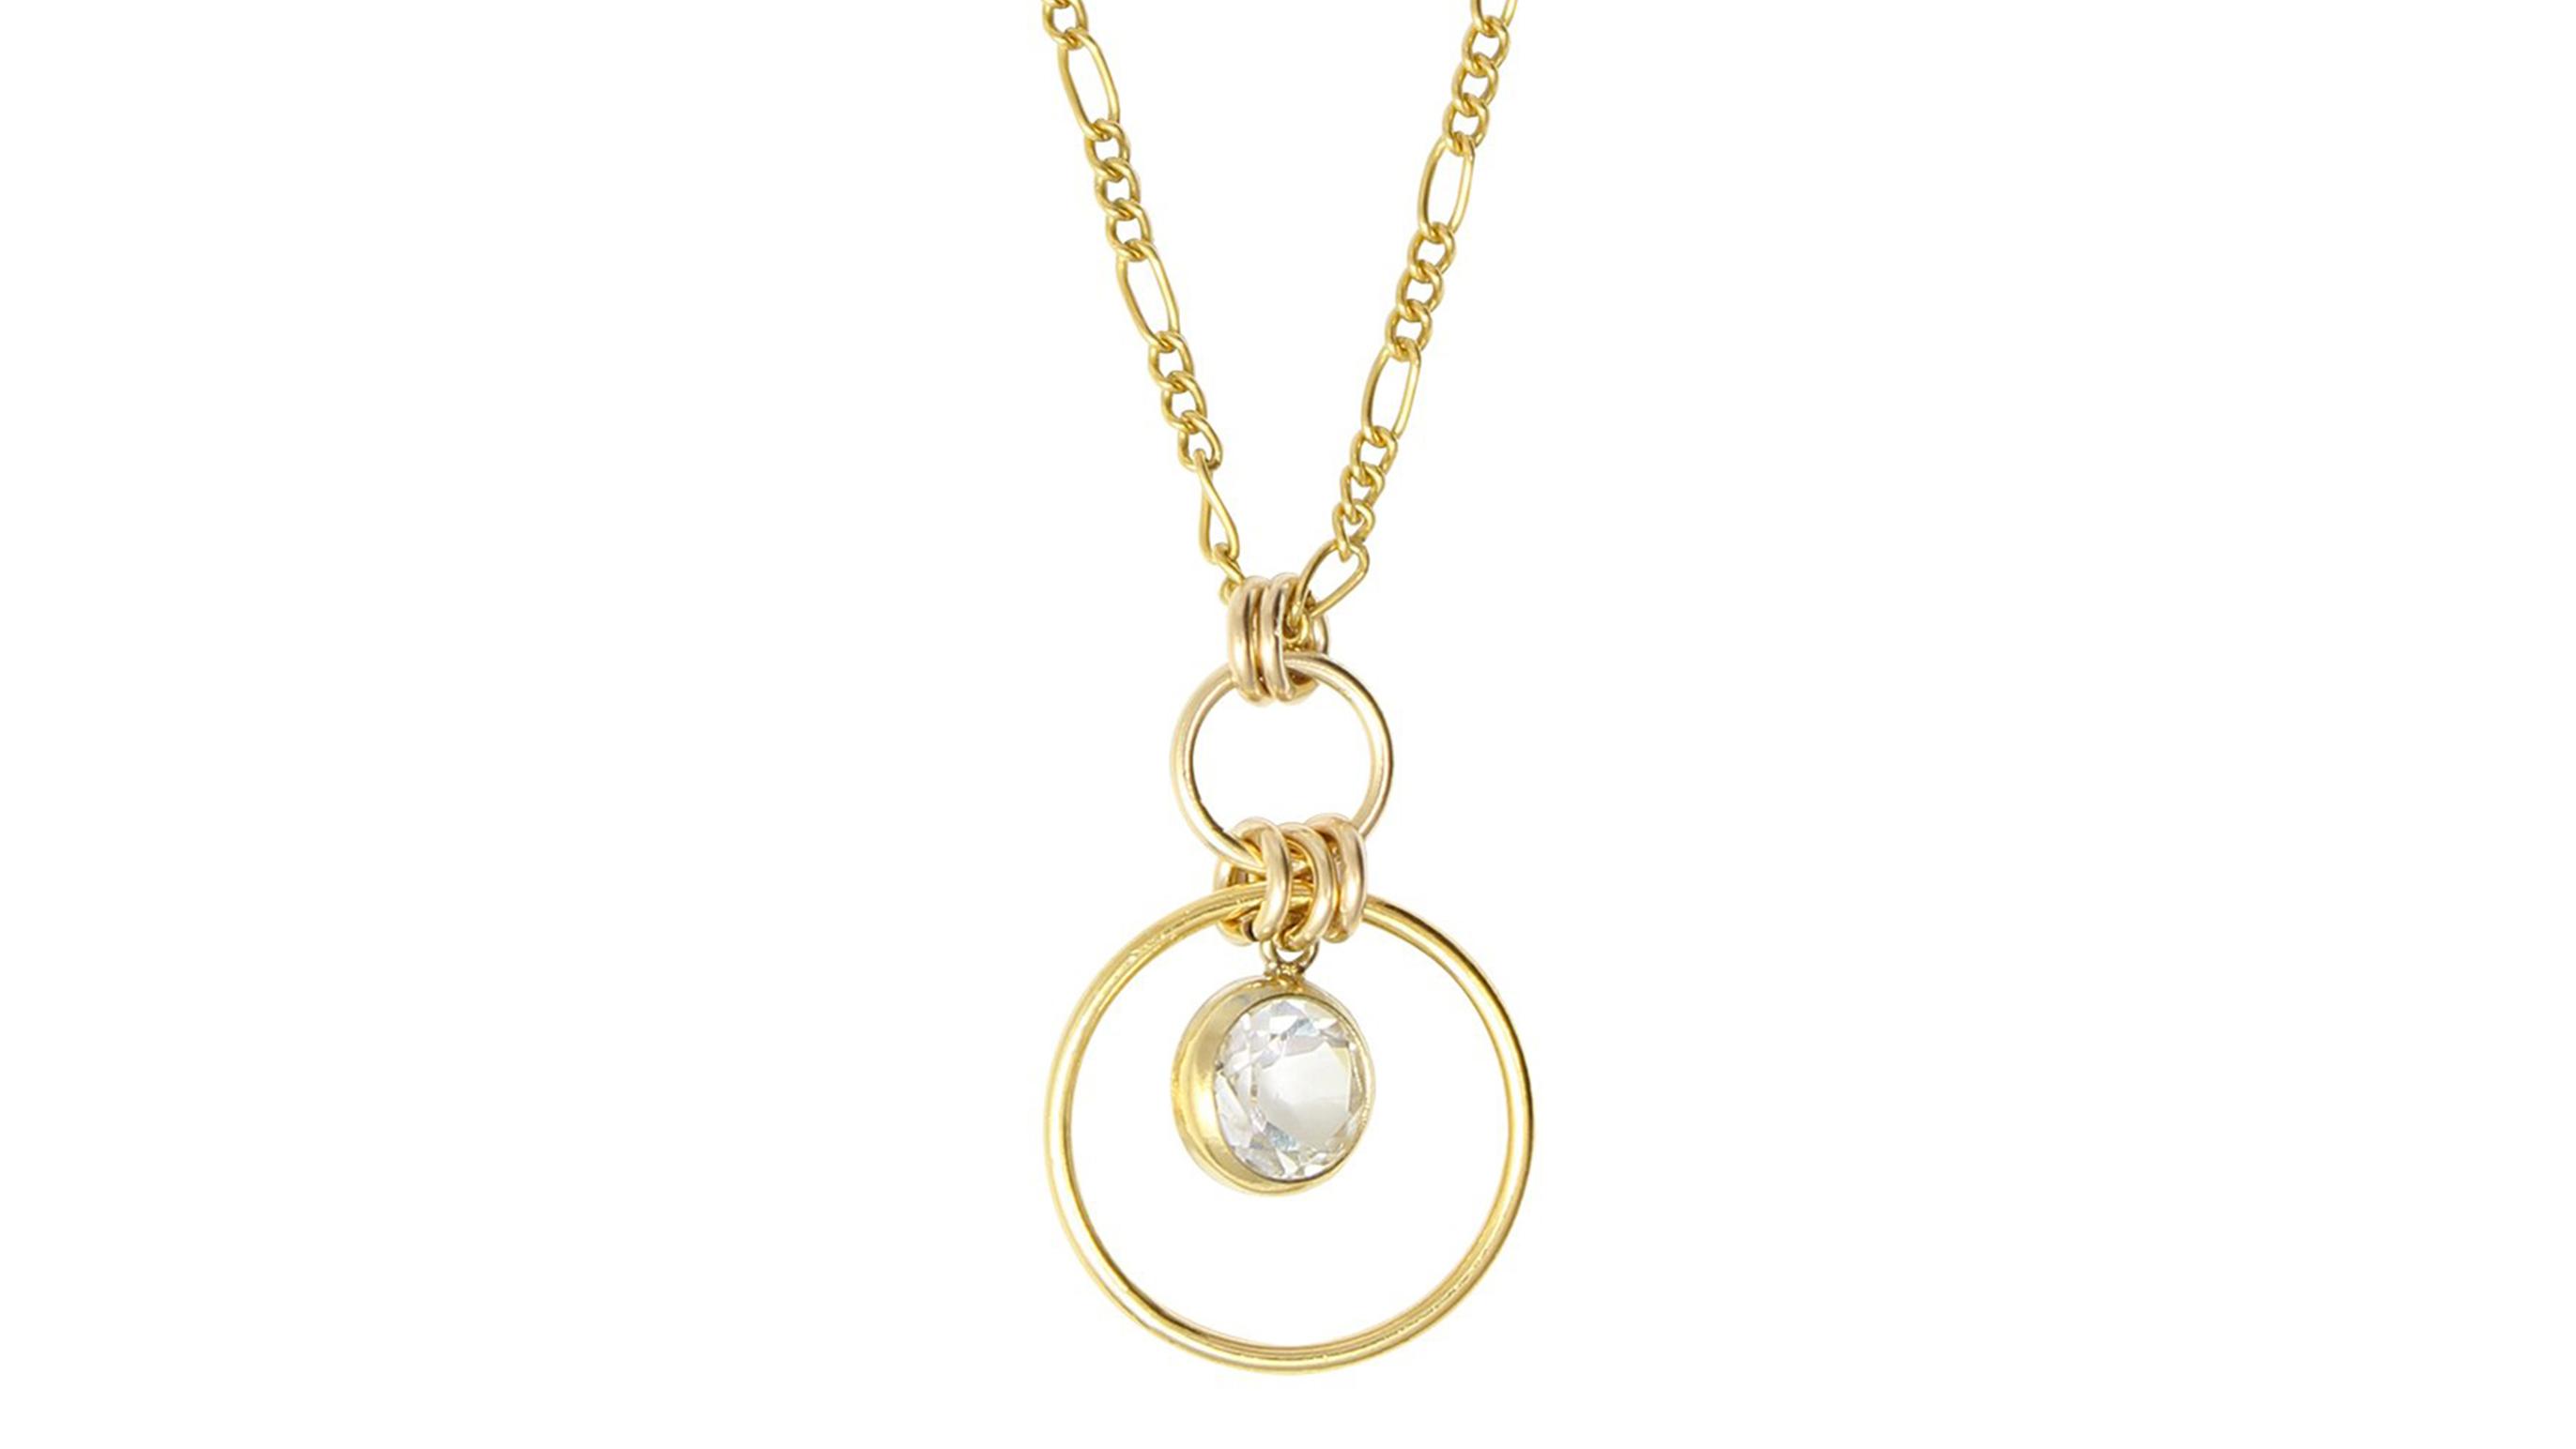 Necklace by Alison Fern